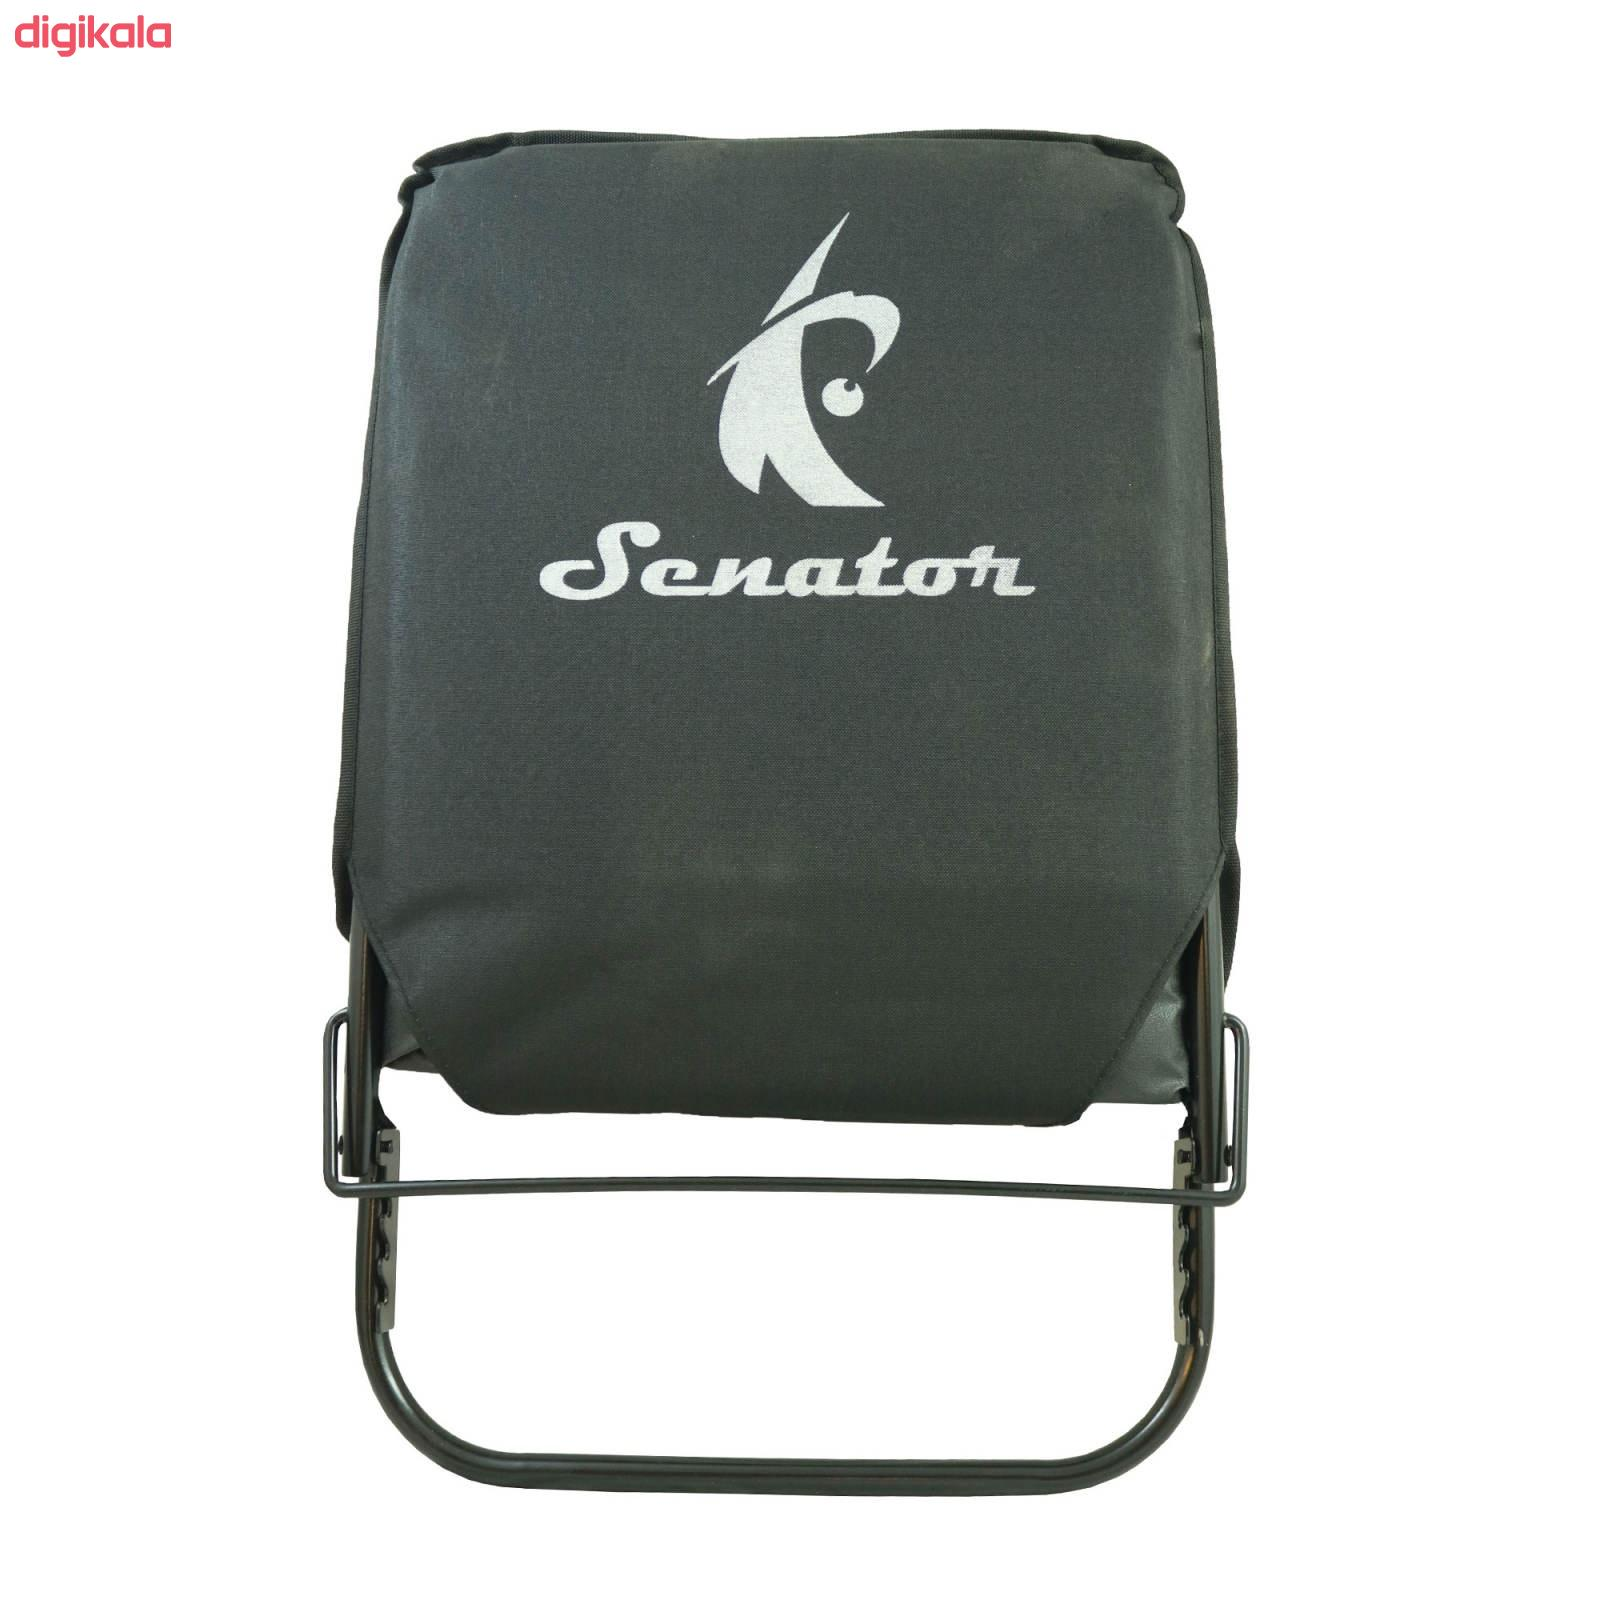 صندلی سفری سناتور کد 3M20 main 1 2